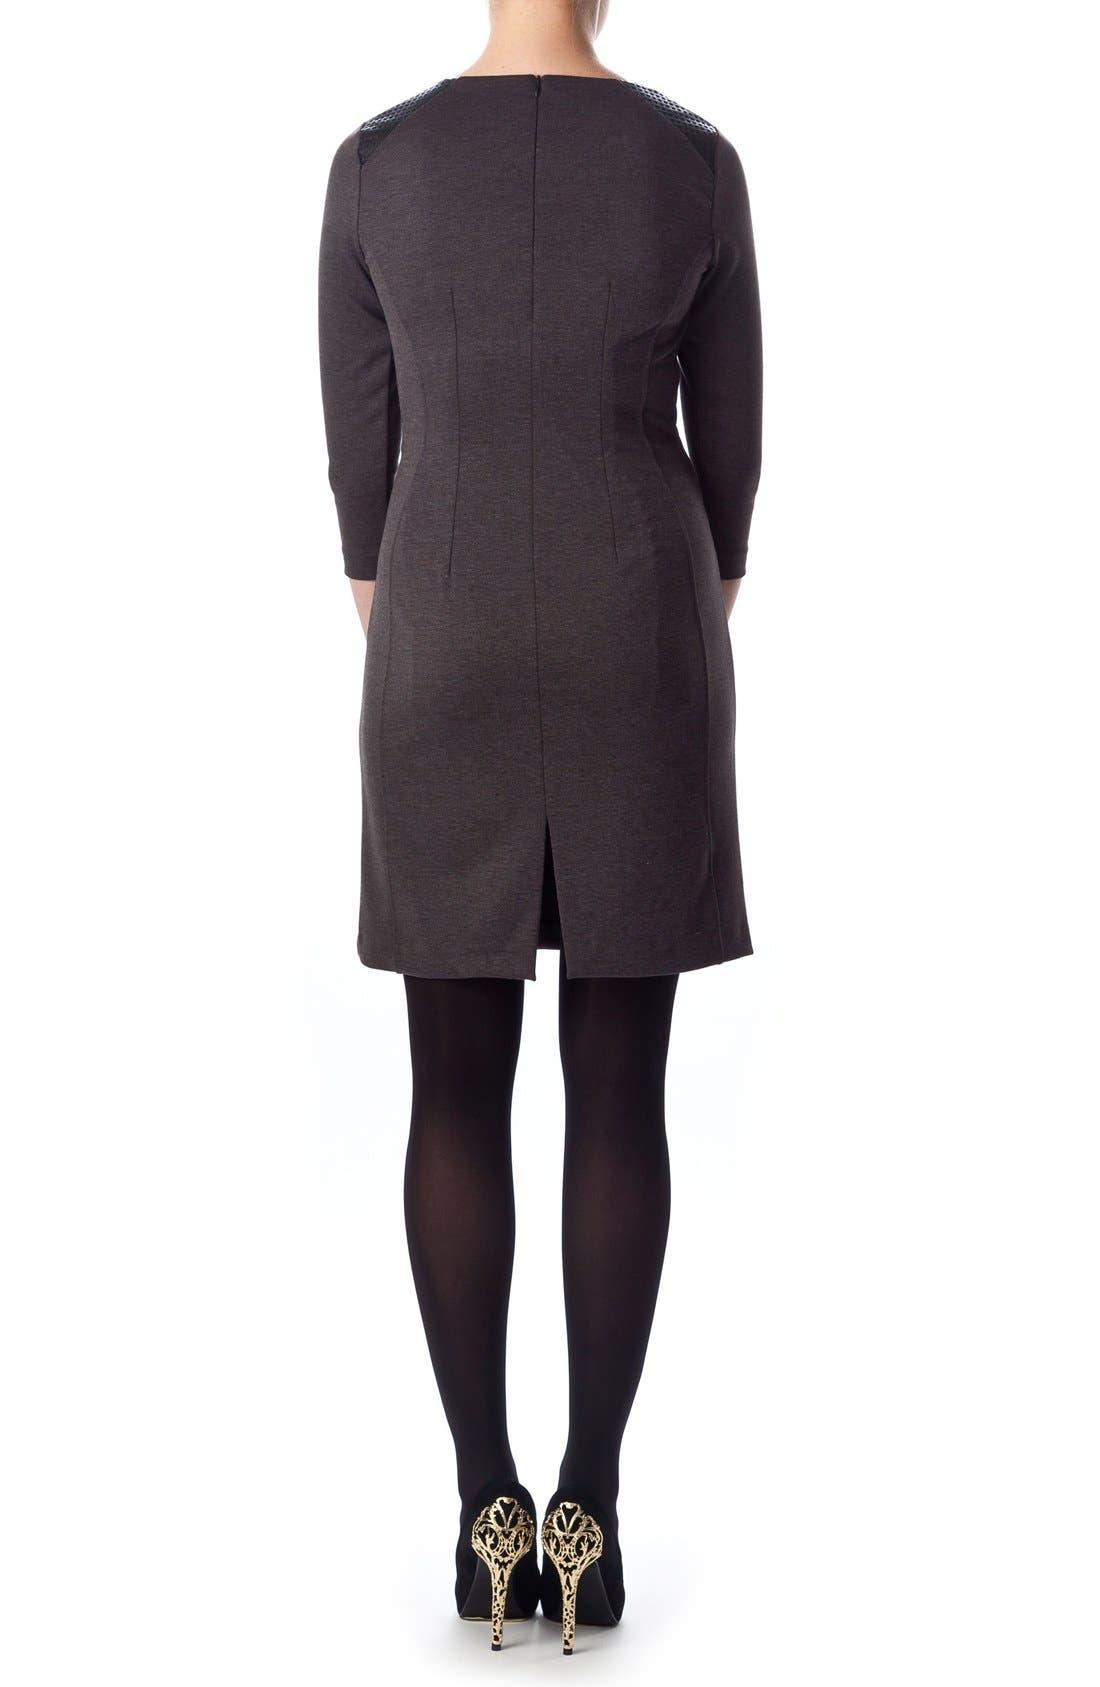 Milano Ponte Dress,                             Alternate thumbnail 2, color,                             Dark Grey Melange/ Black